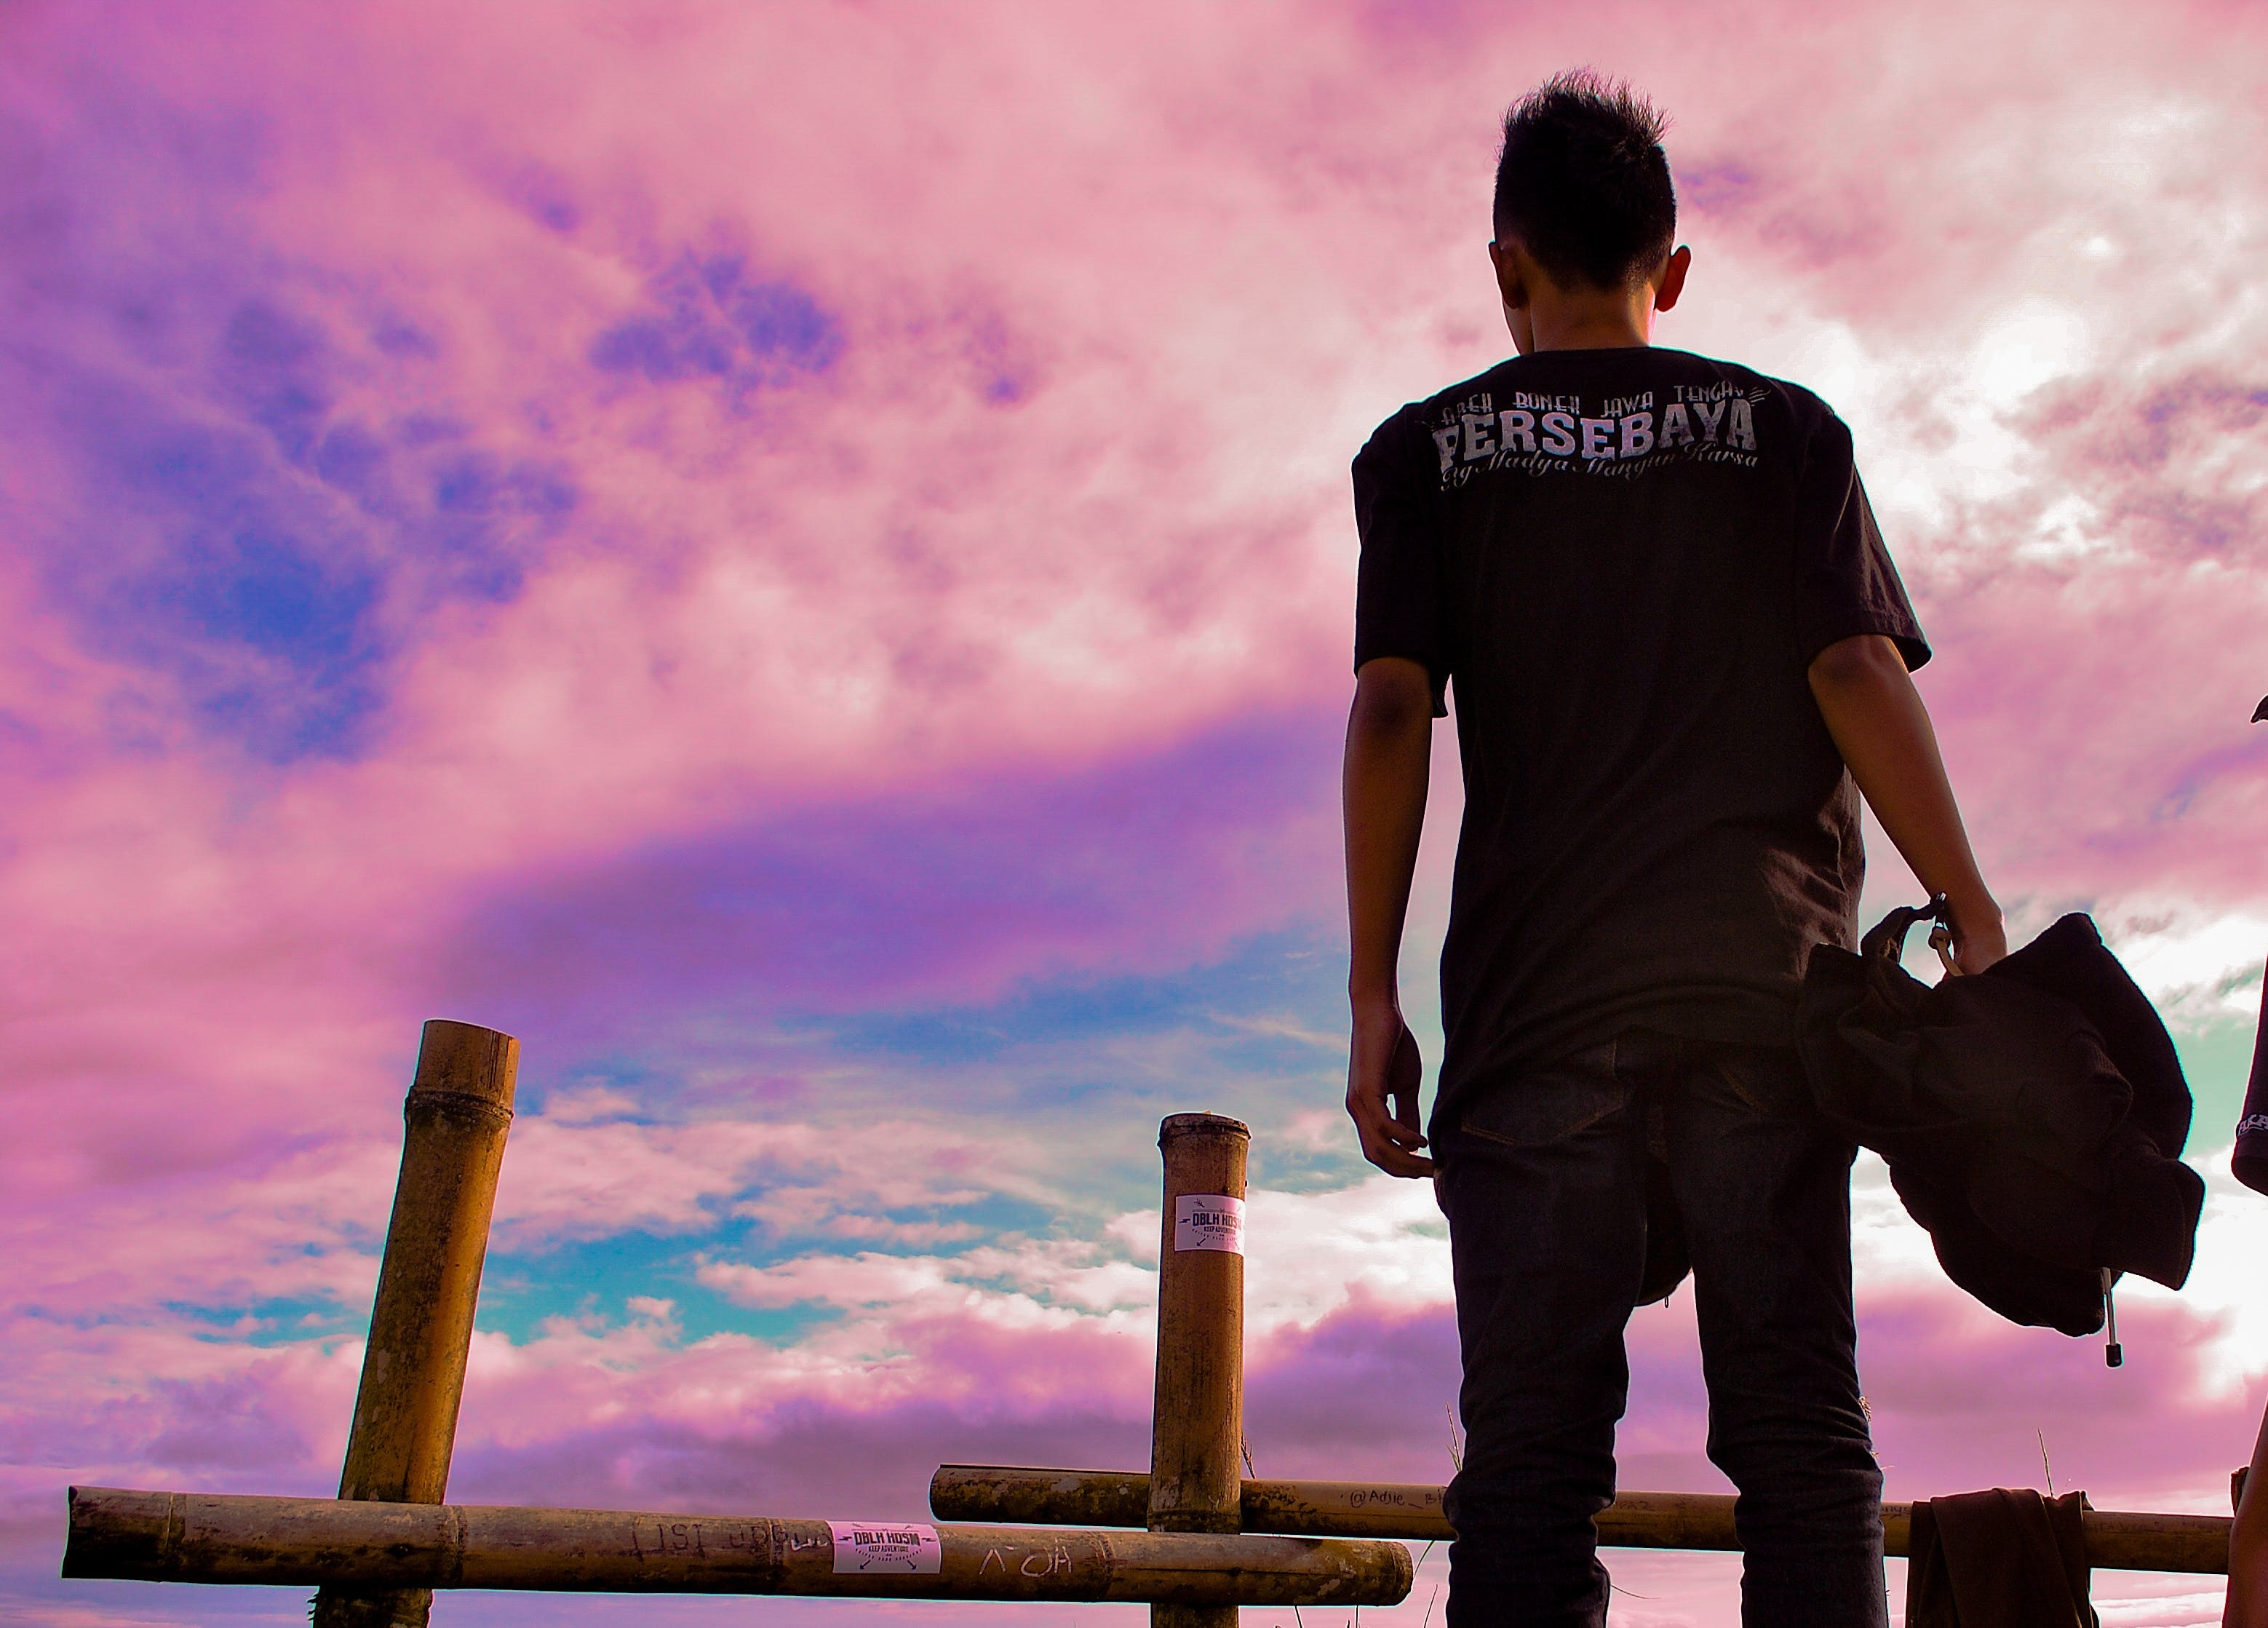 Man Wearing Black T-shirt Standing Near Bamboo Rack